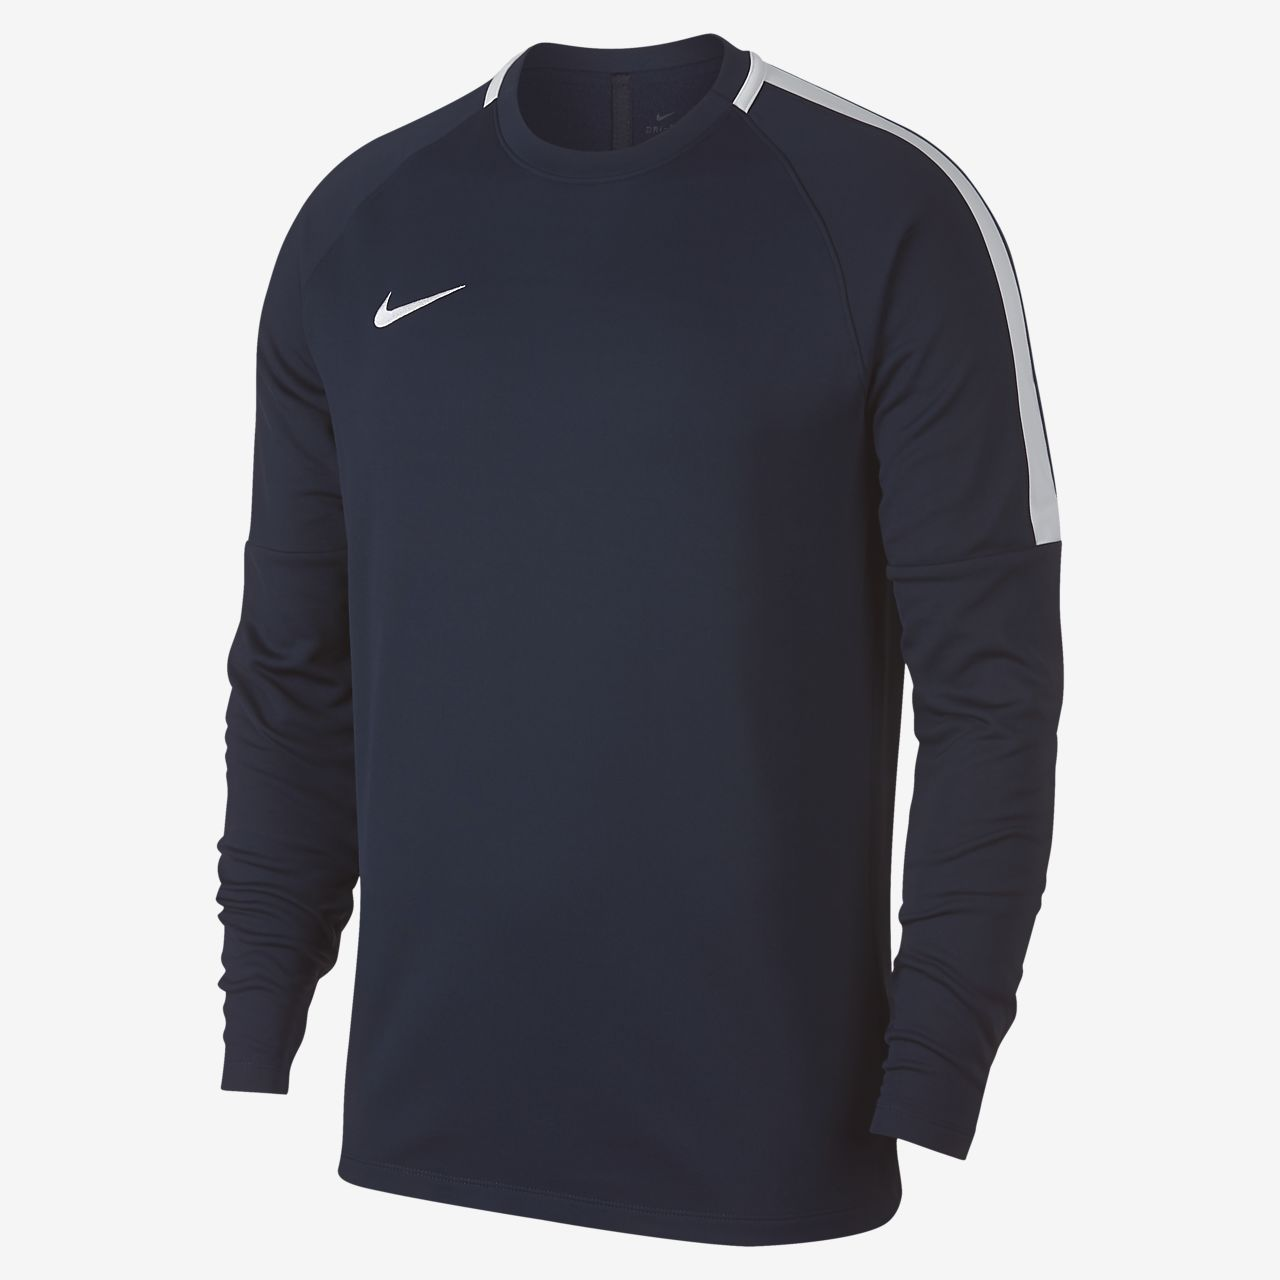 Felpa da calcio Nike Dri-FIT Academy - Uomo